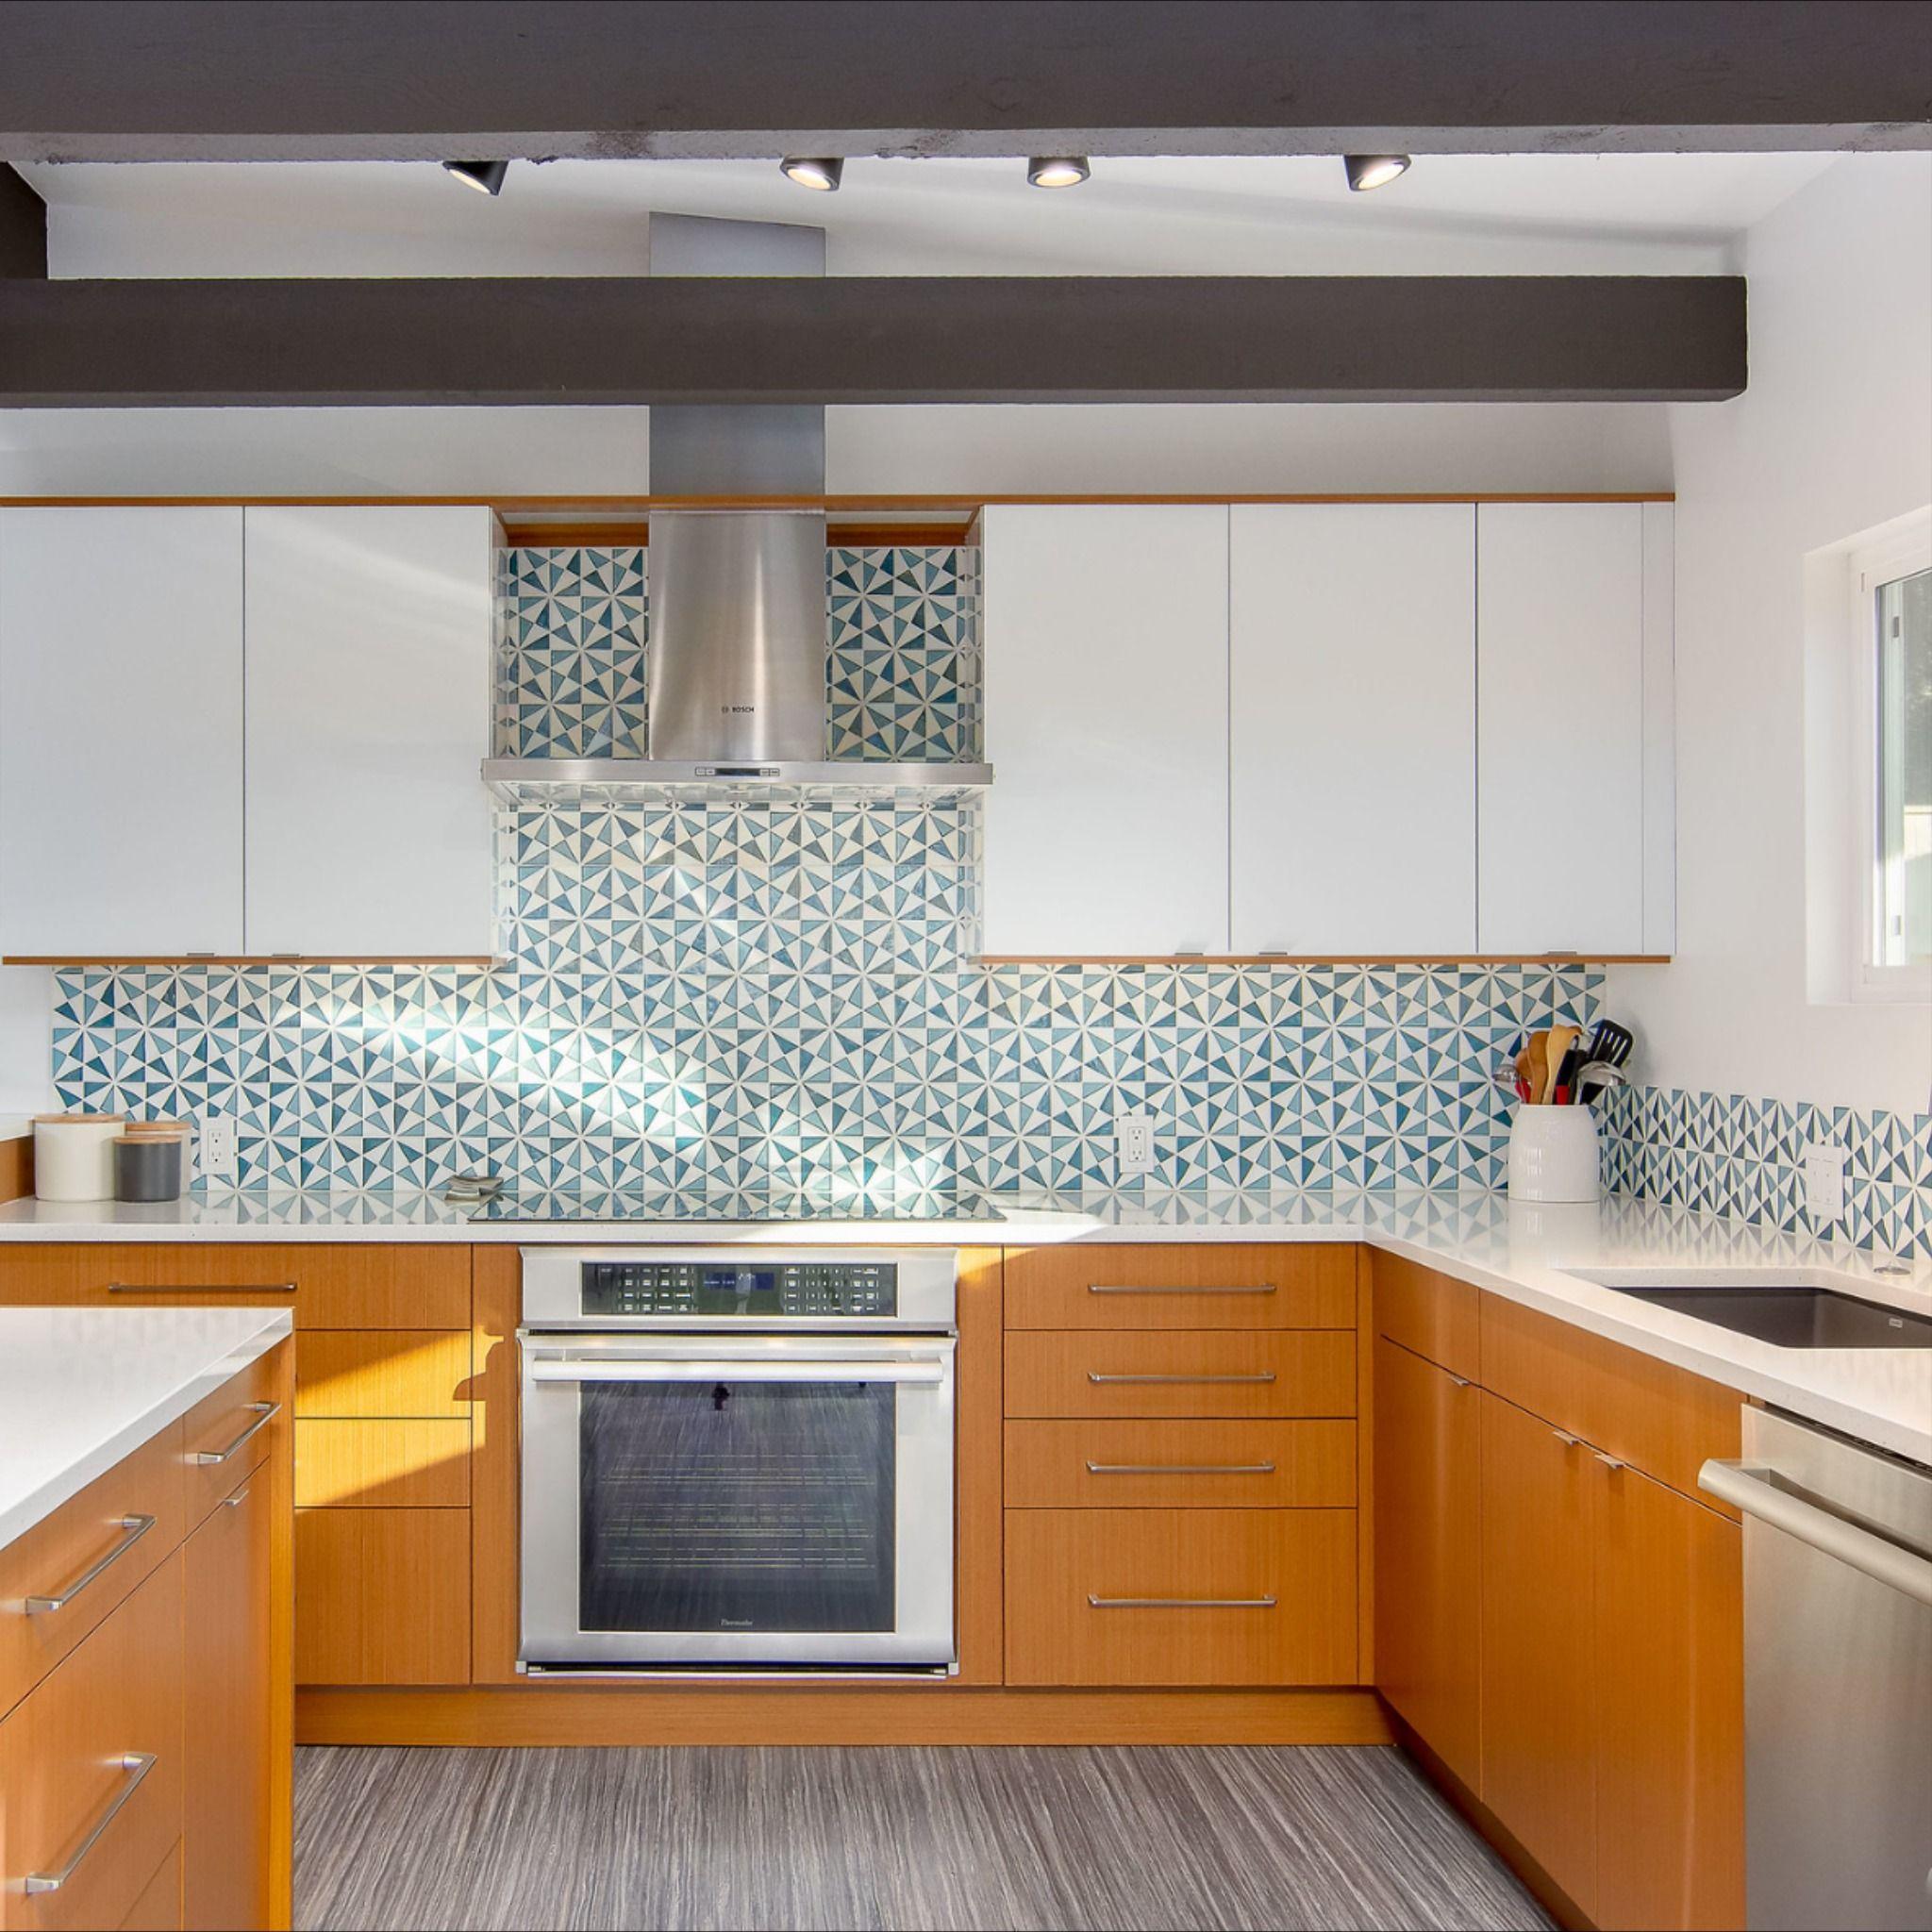 Mid Century Modern Kitchen Remodel In Eugene Oregon In 2020 Mid Century Modern Kitchen Modern Kitchen Design Kitchen Remodel